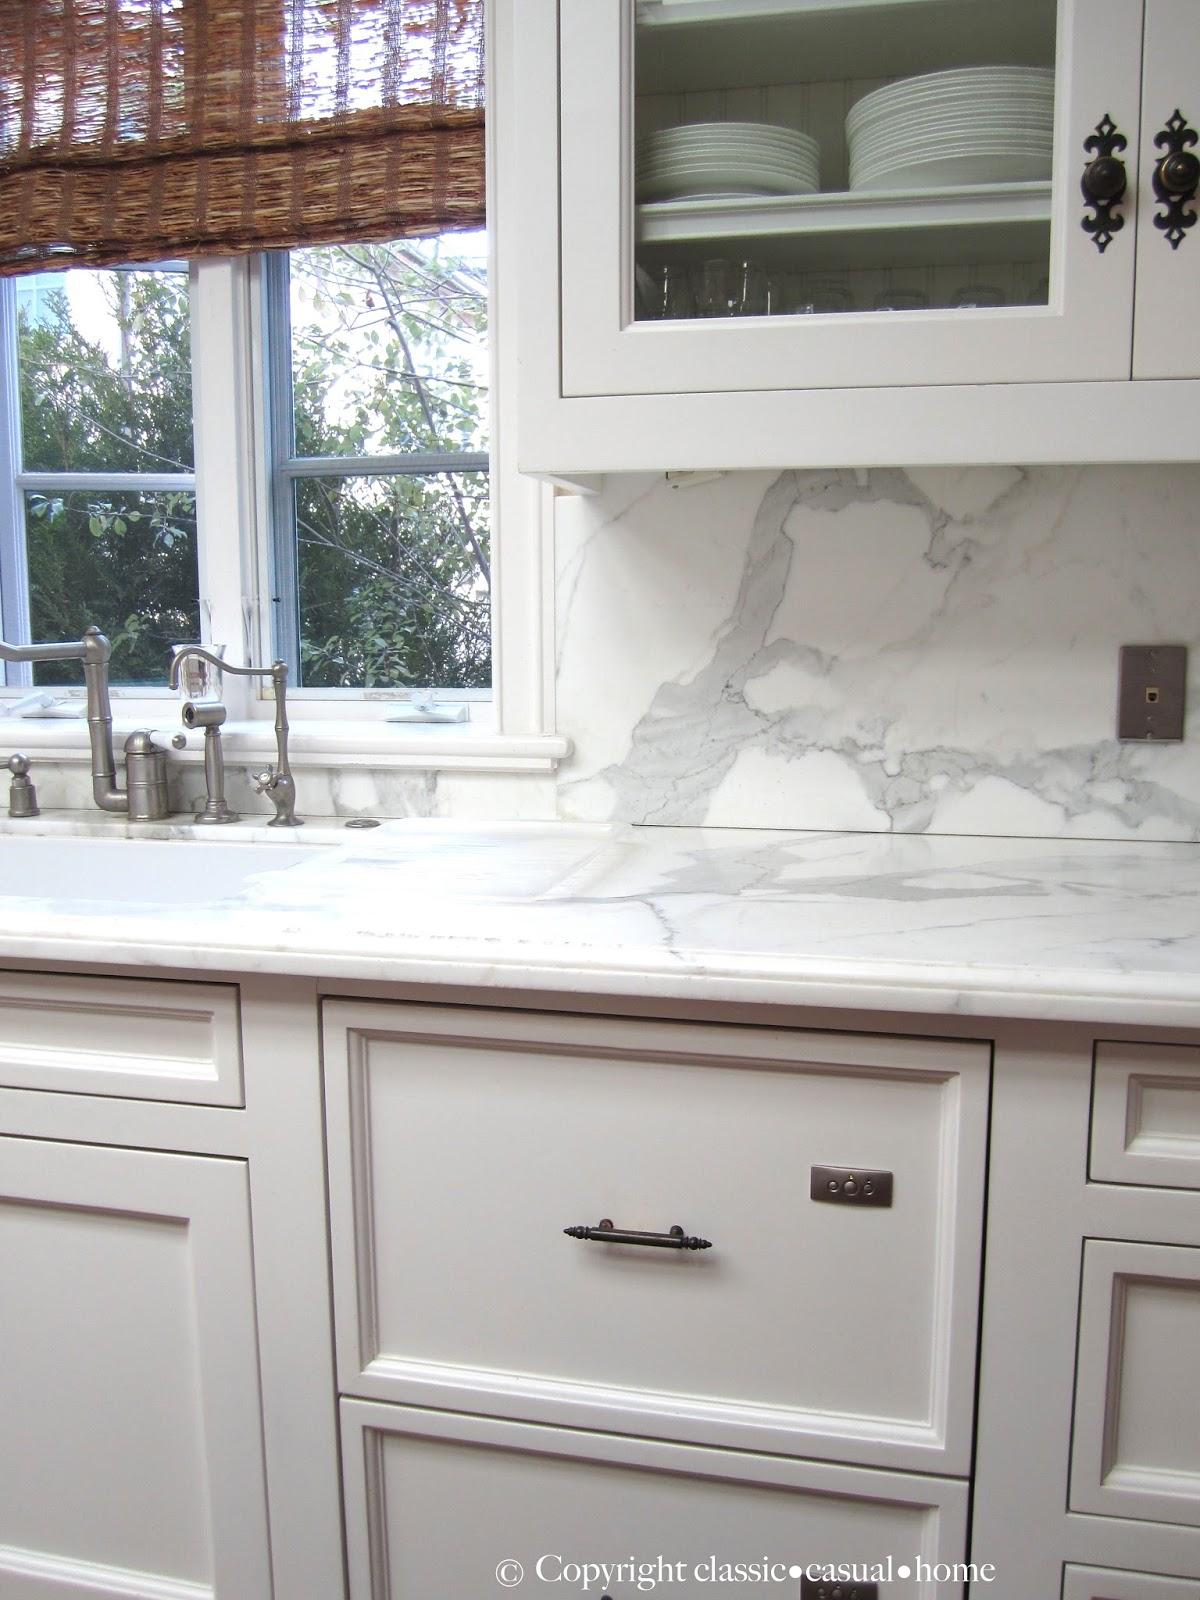 classic white kitchen backsplashes classic casual home. Black Bedroom Furniture Sets. Home Design Ideas